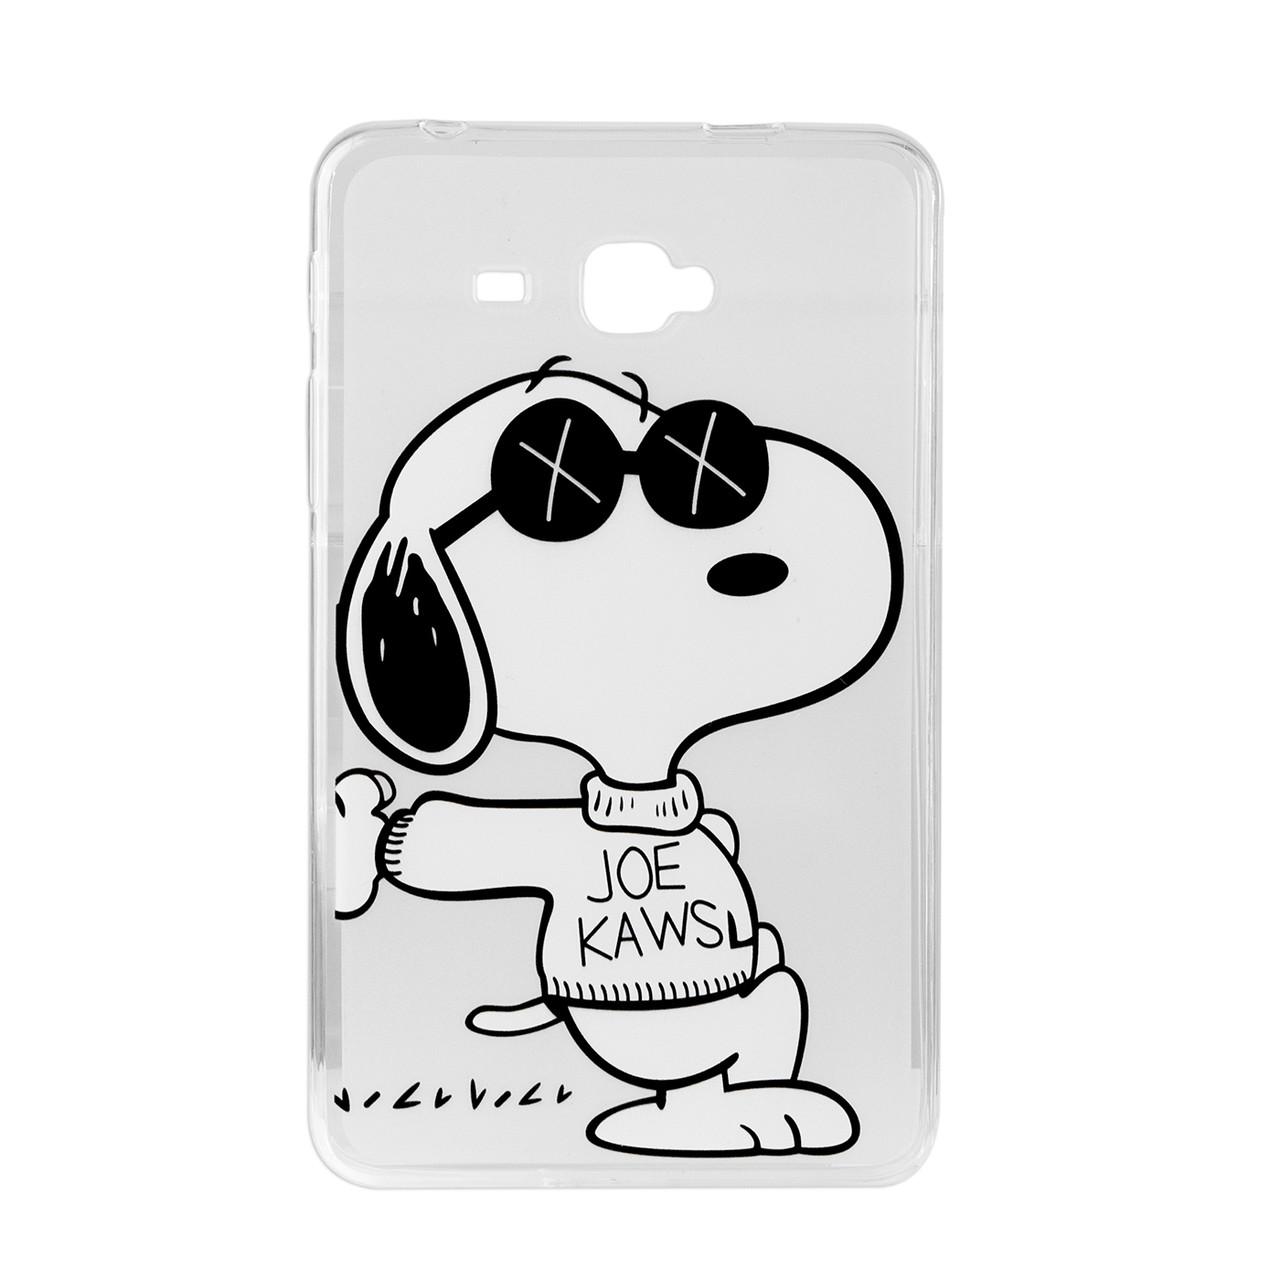 Чехол для Samsung Galaxy Tab A 7.0 SM-T285 back cover TPU Hu Ang Snoopy, Clear